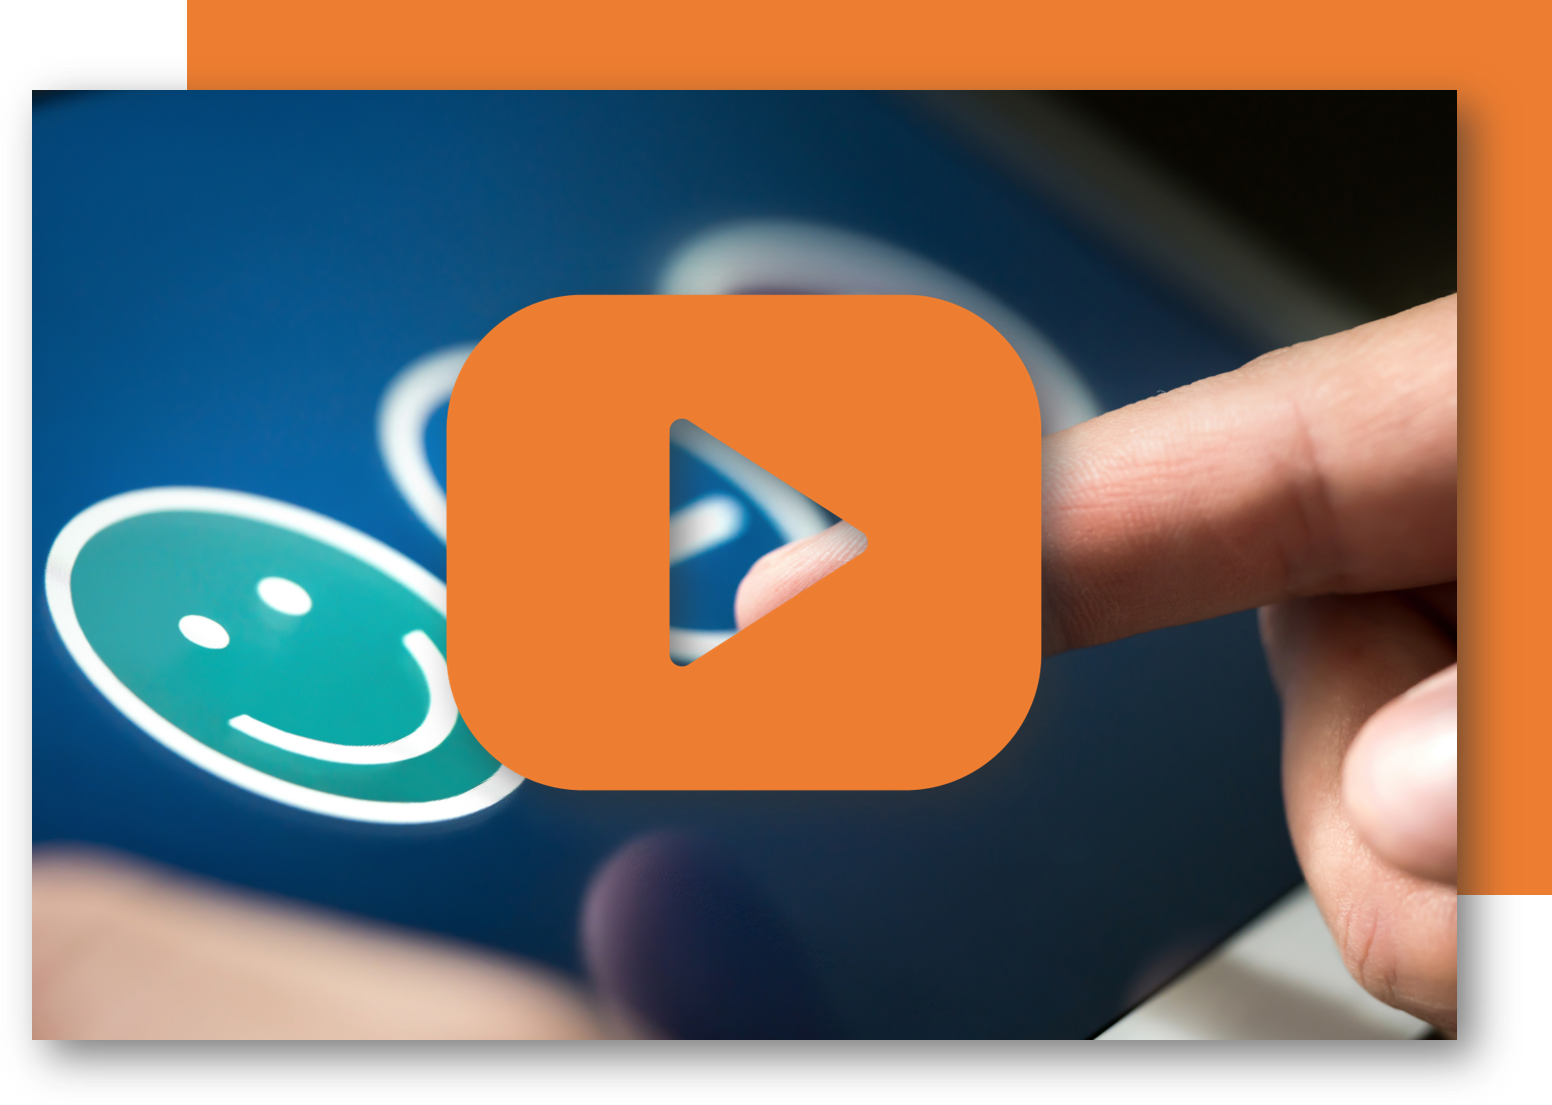 play button speech analytics webinar image 5